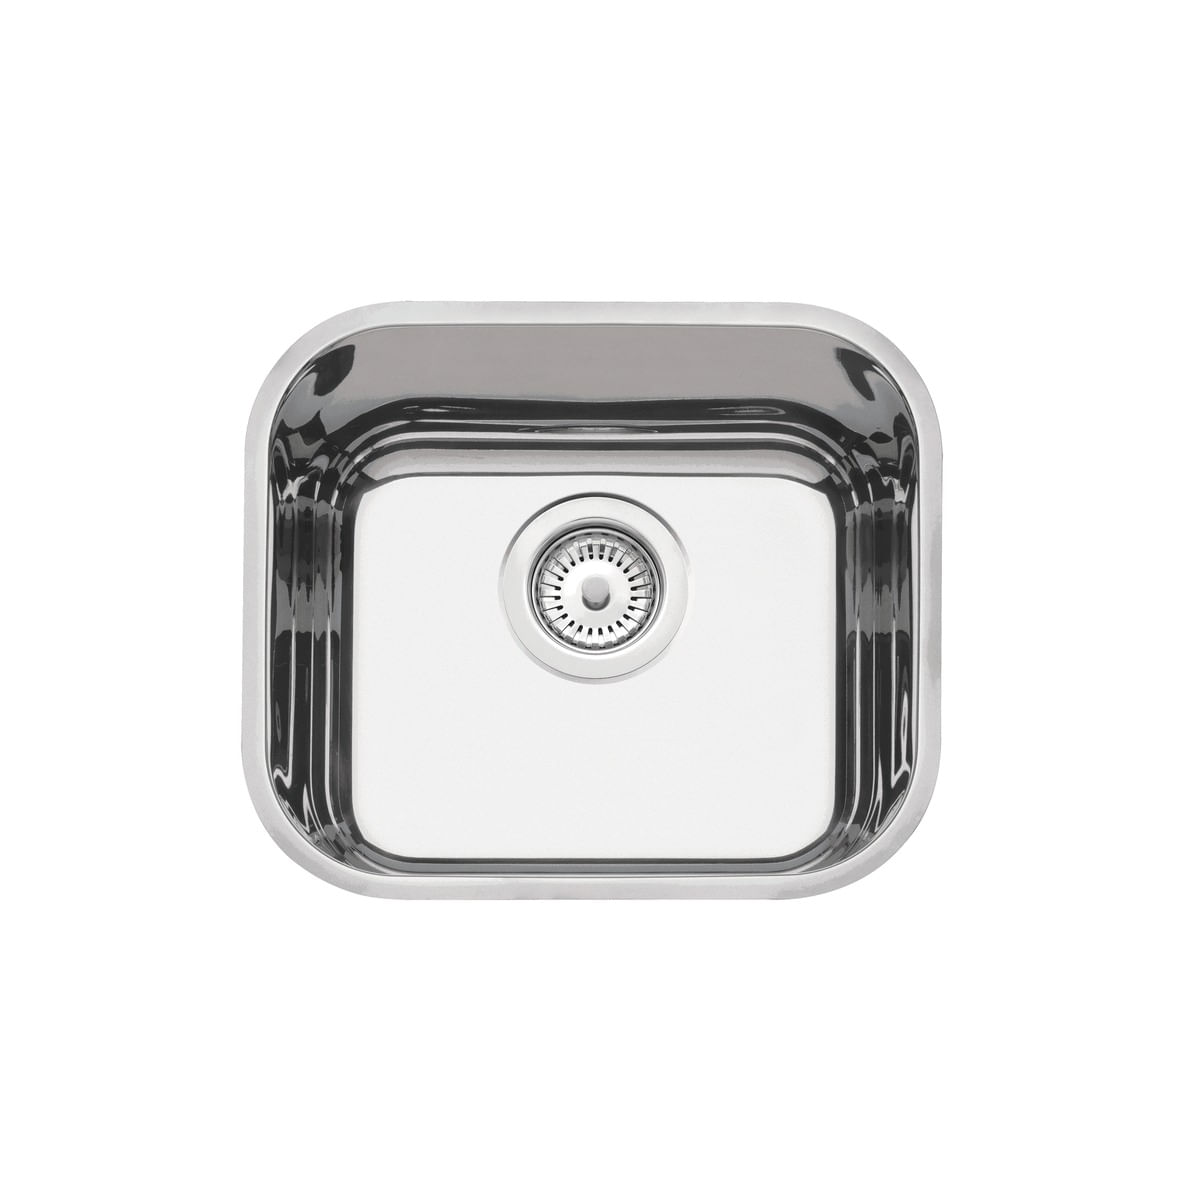 Cuba n.0 Tramontina 40 x 34 x 14 cm Lavínia 40 BL Perfecta em Aço Inox 304 Polido Com Válvula 94050402